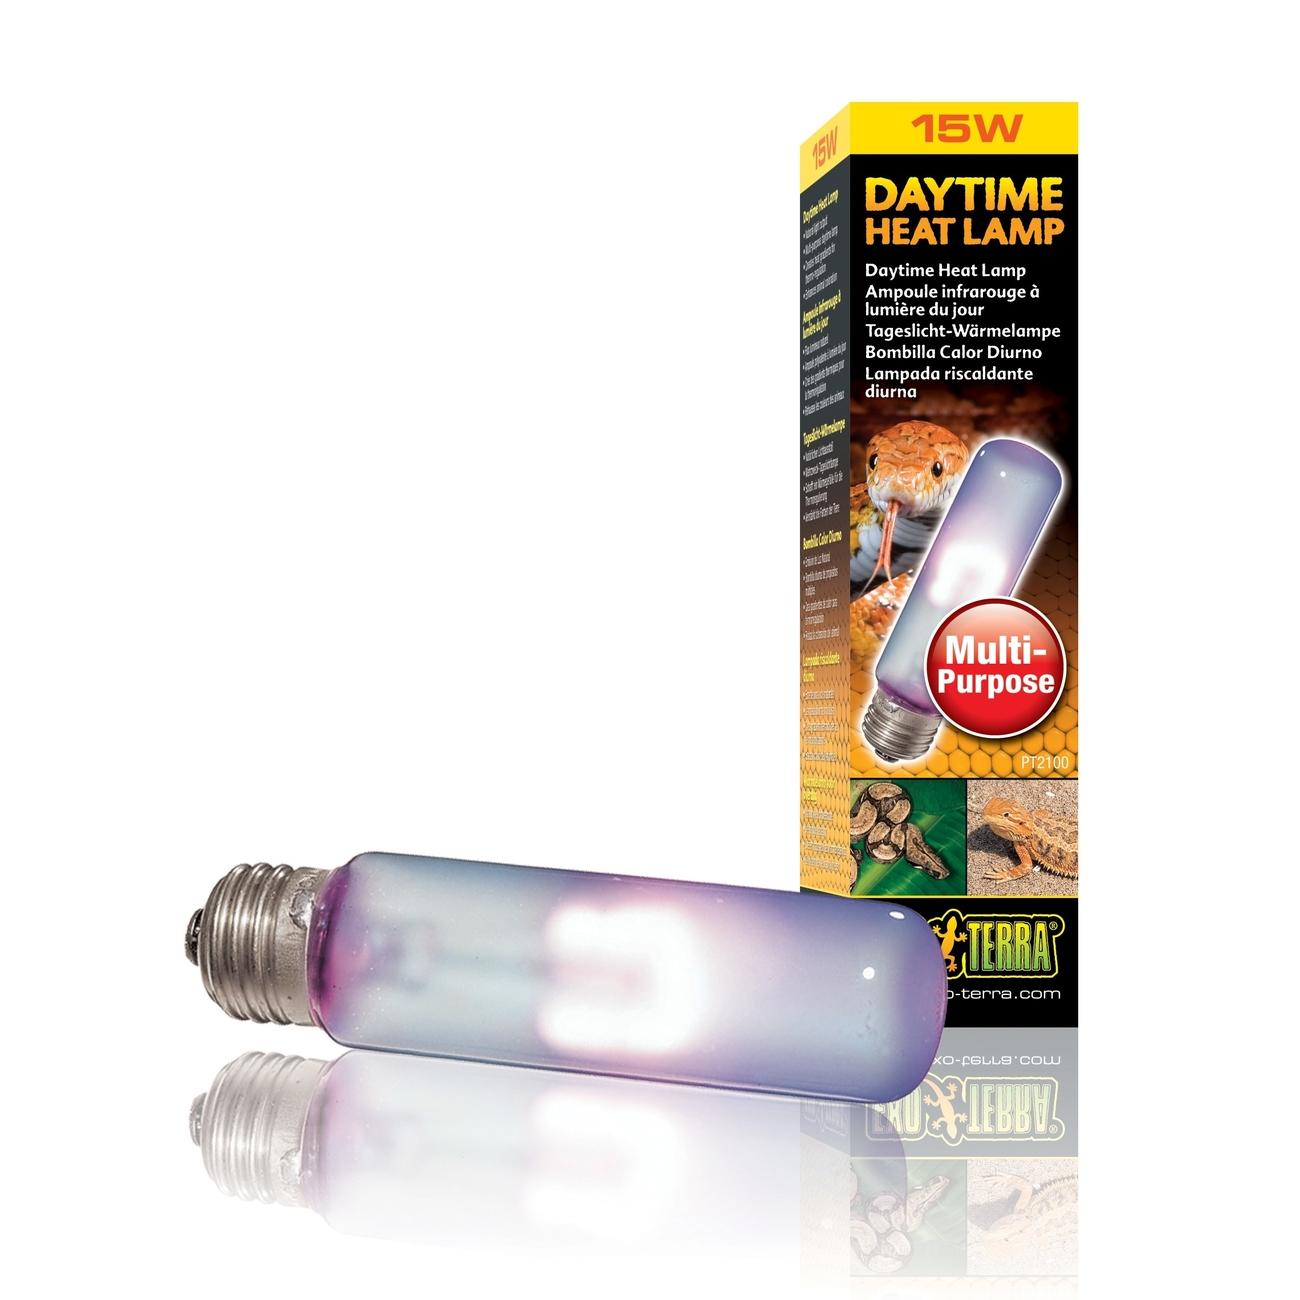 Exo Terra - Daytime Heat Lampe